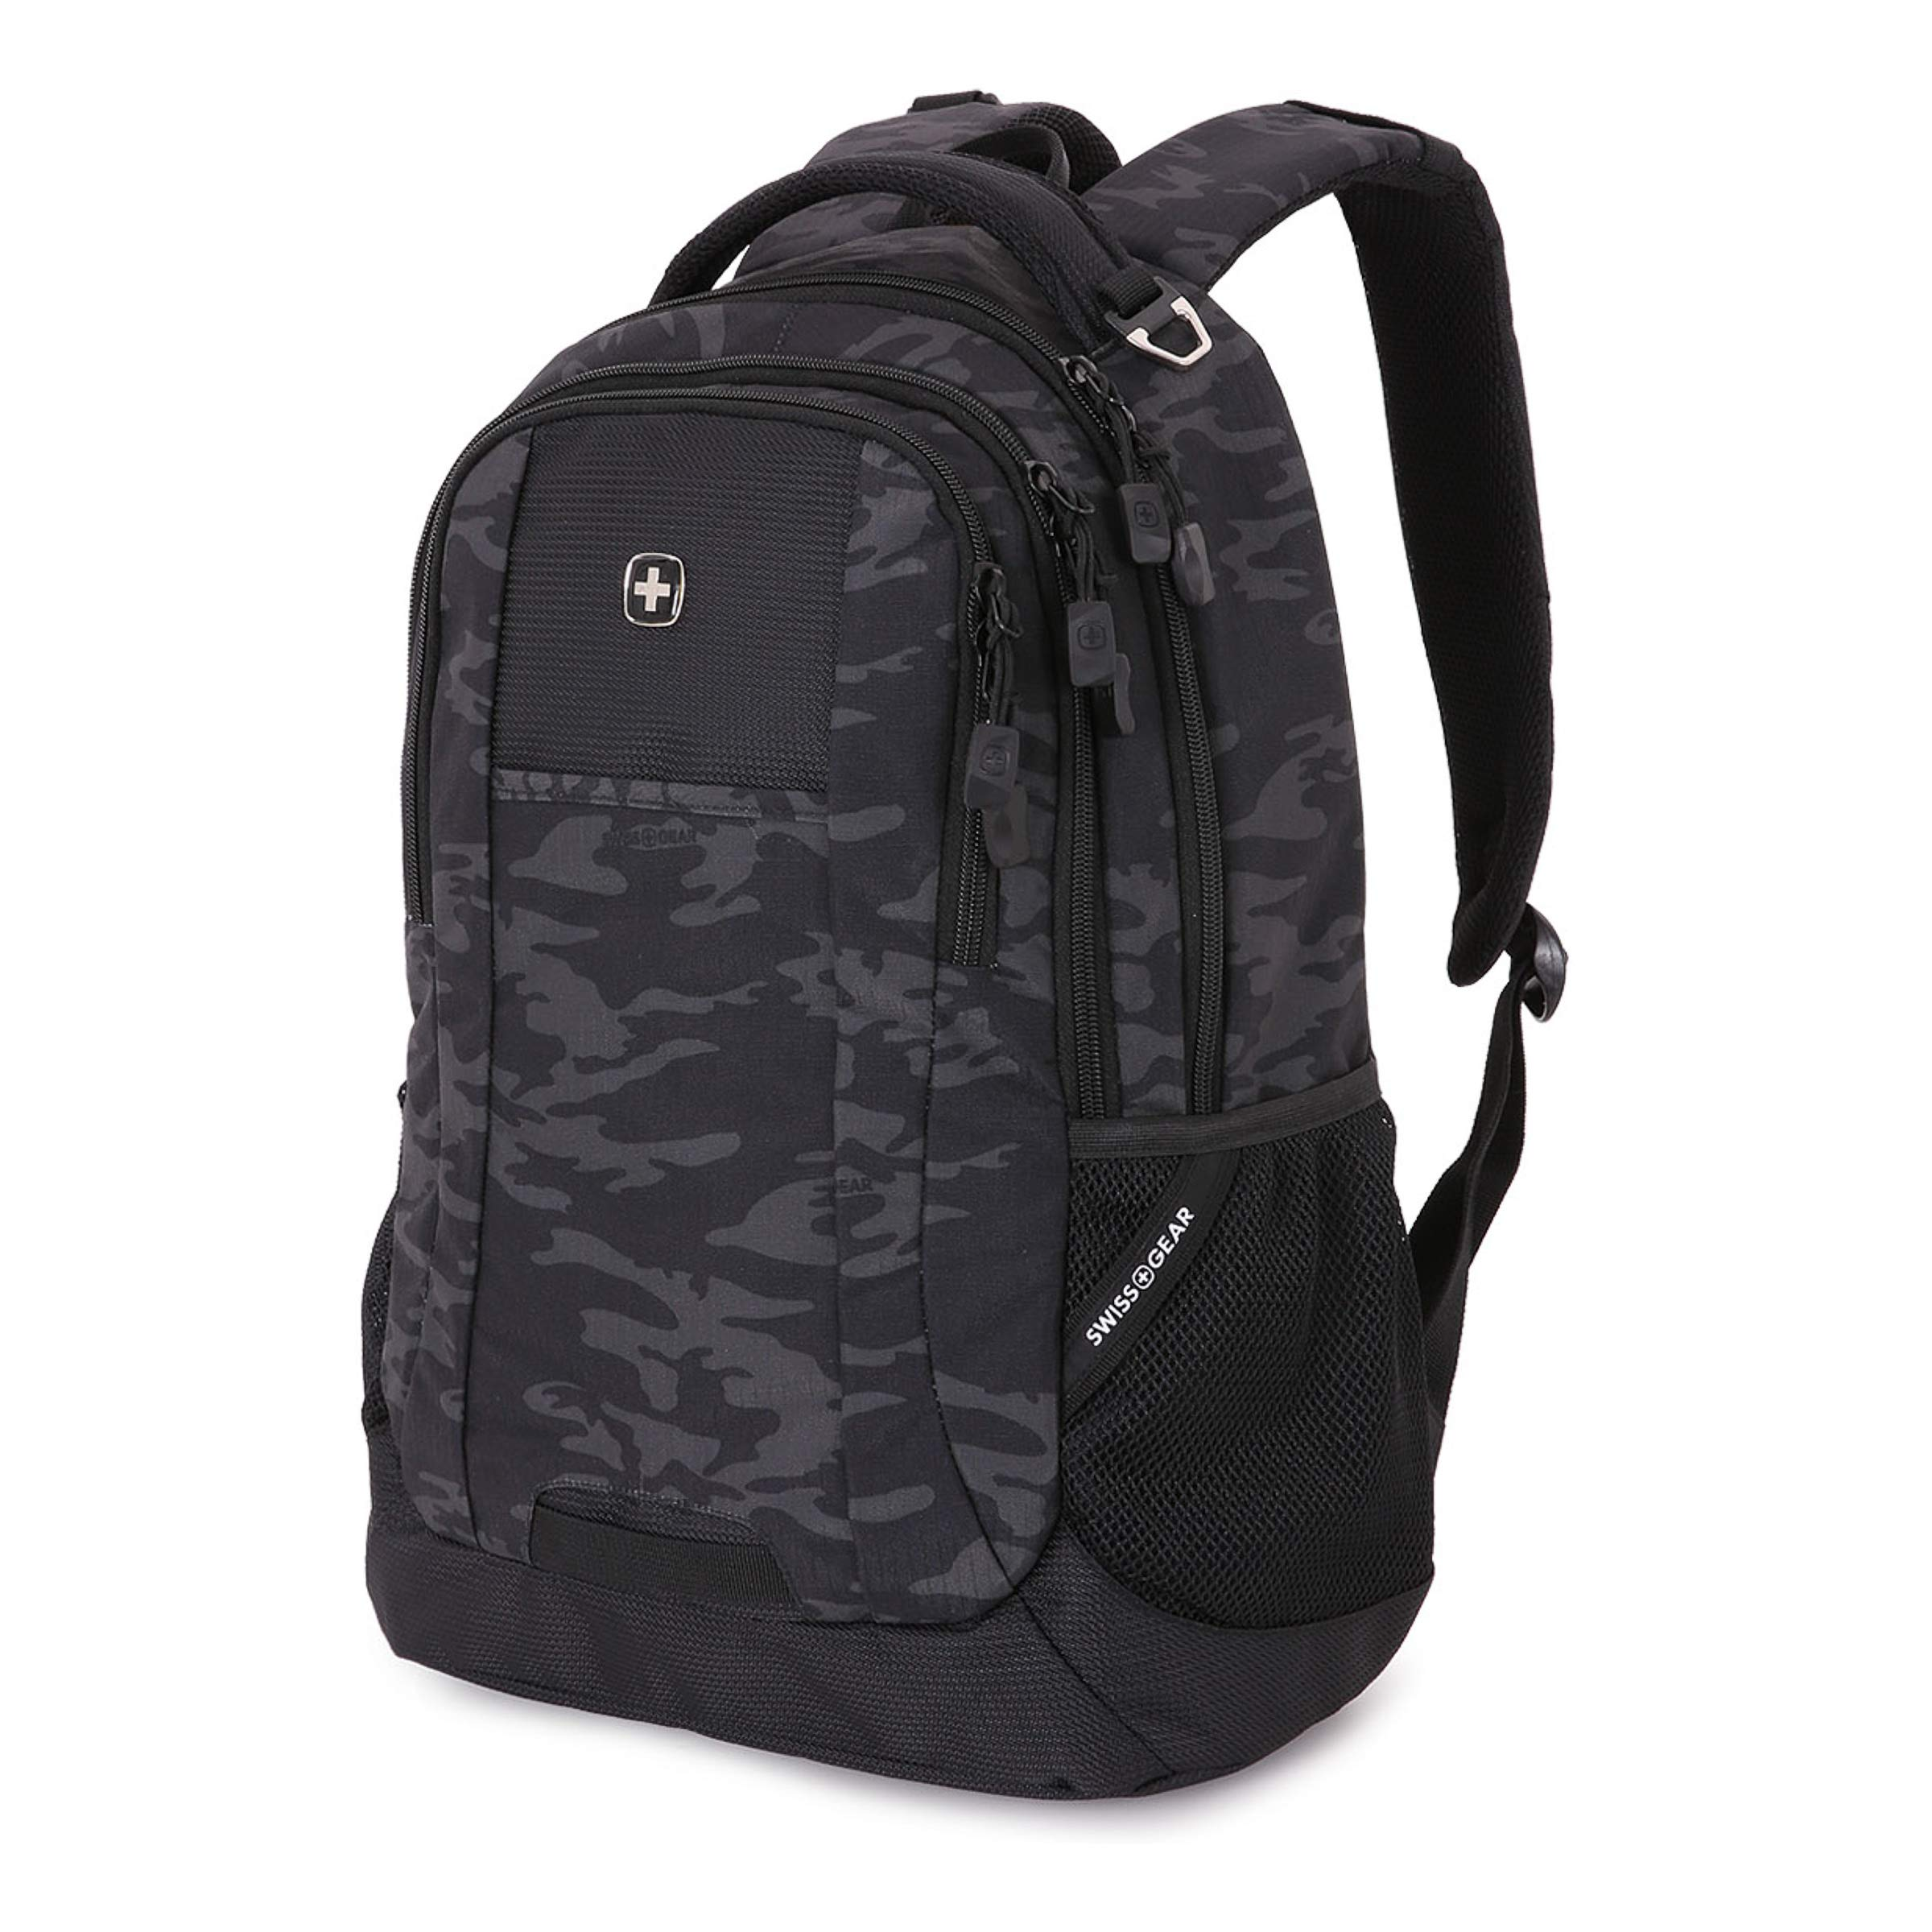 SwissGear Cecil Backpack, Black Cod/Camo, One Size by Swiss Gear